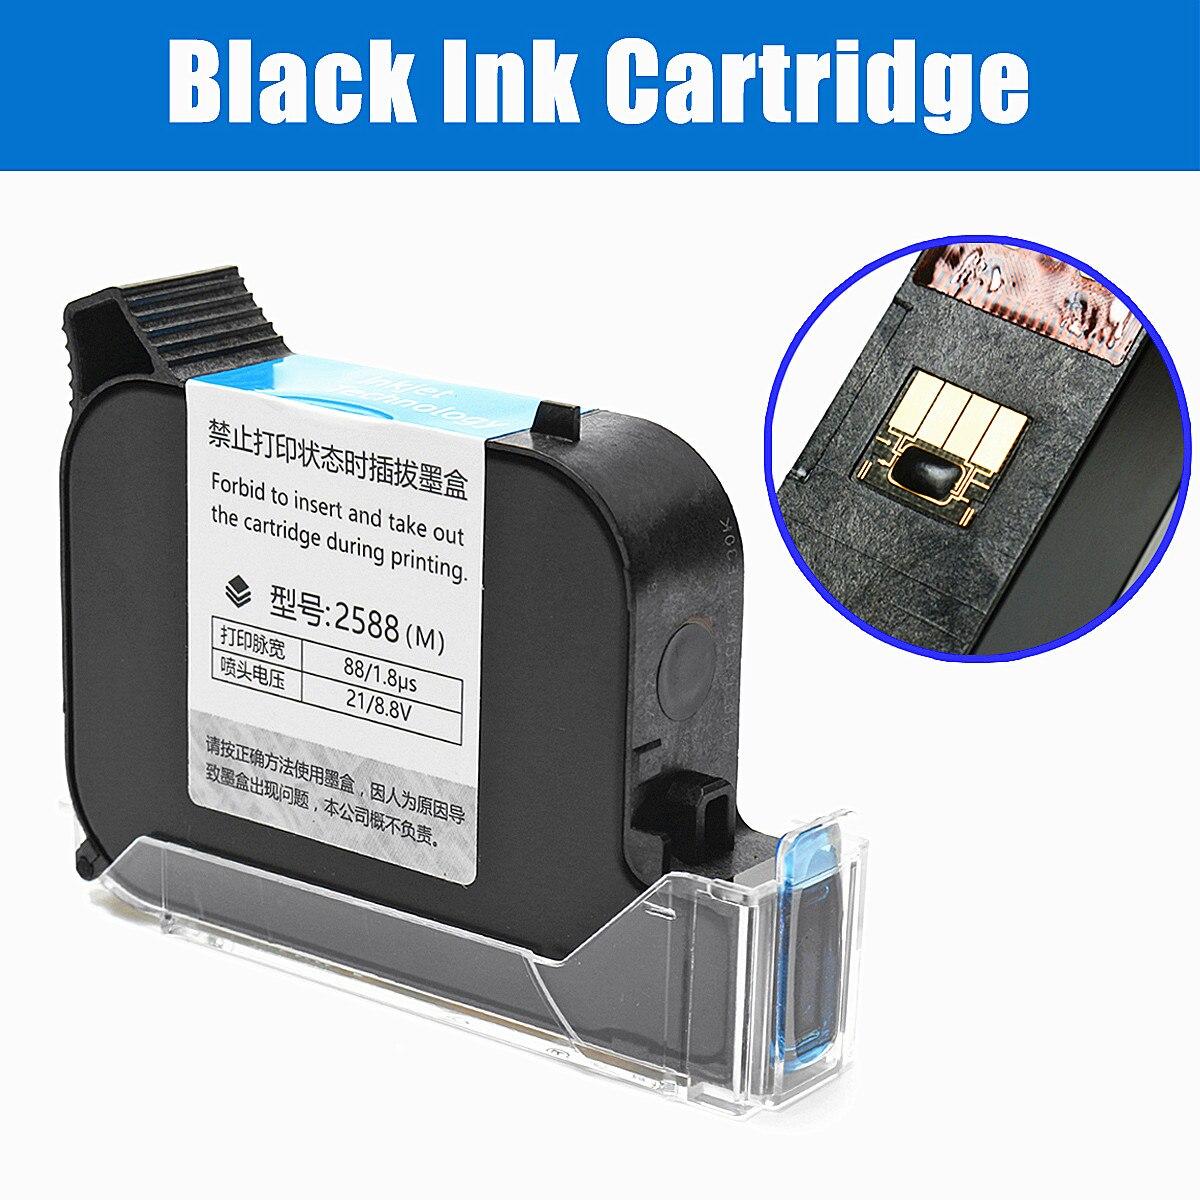 10 x 7 x2cm Black Ink Quick-drying Ink Cartridge For Inkjet Printer Coding Marking Machine 2 pcs black ink cartridge for a180 f inkjet printer